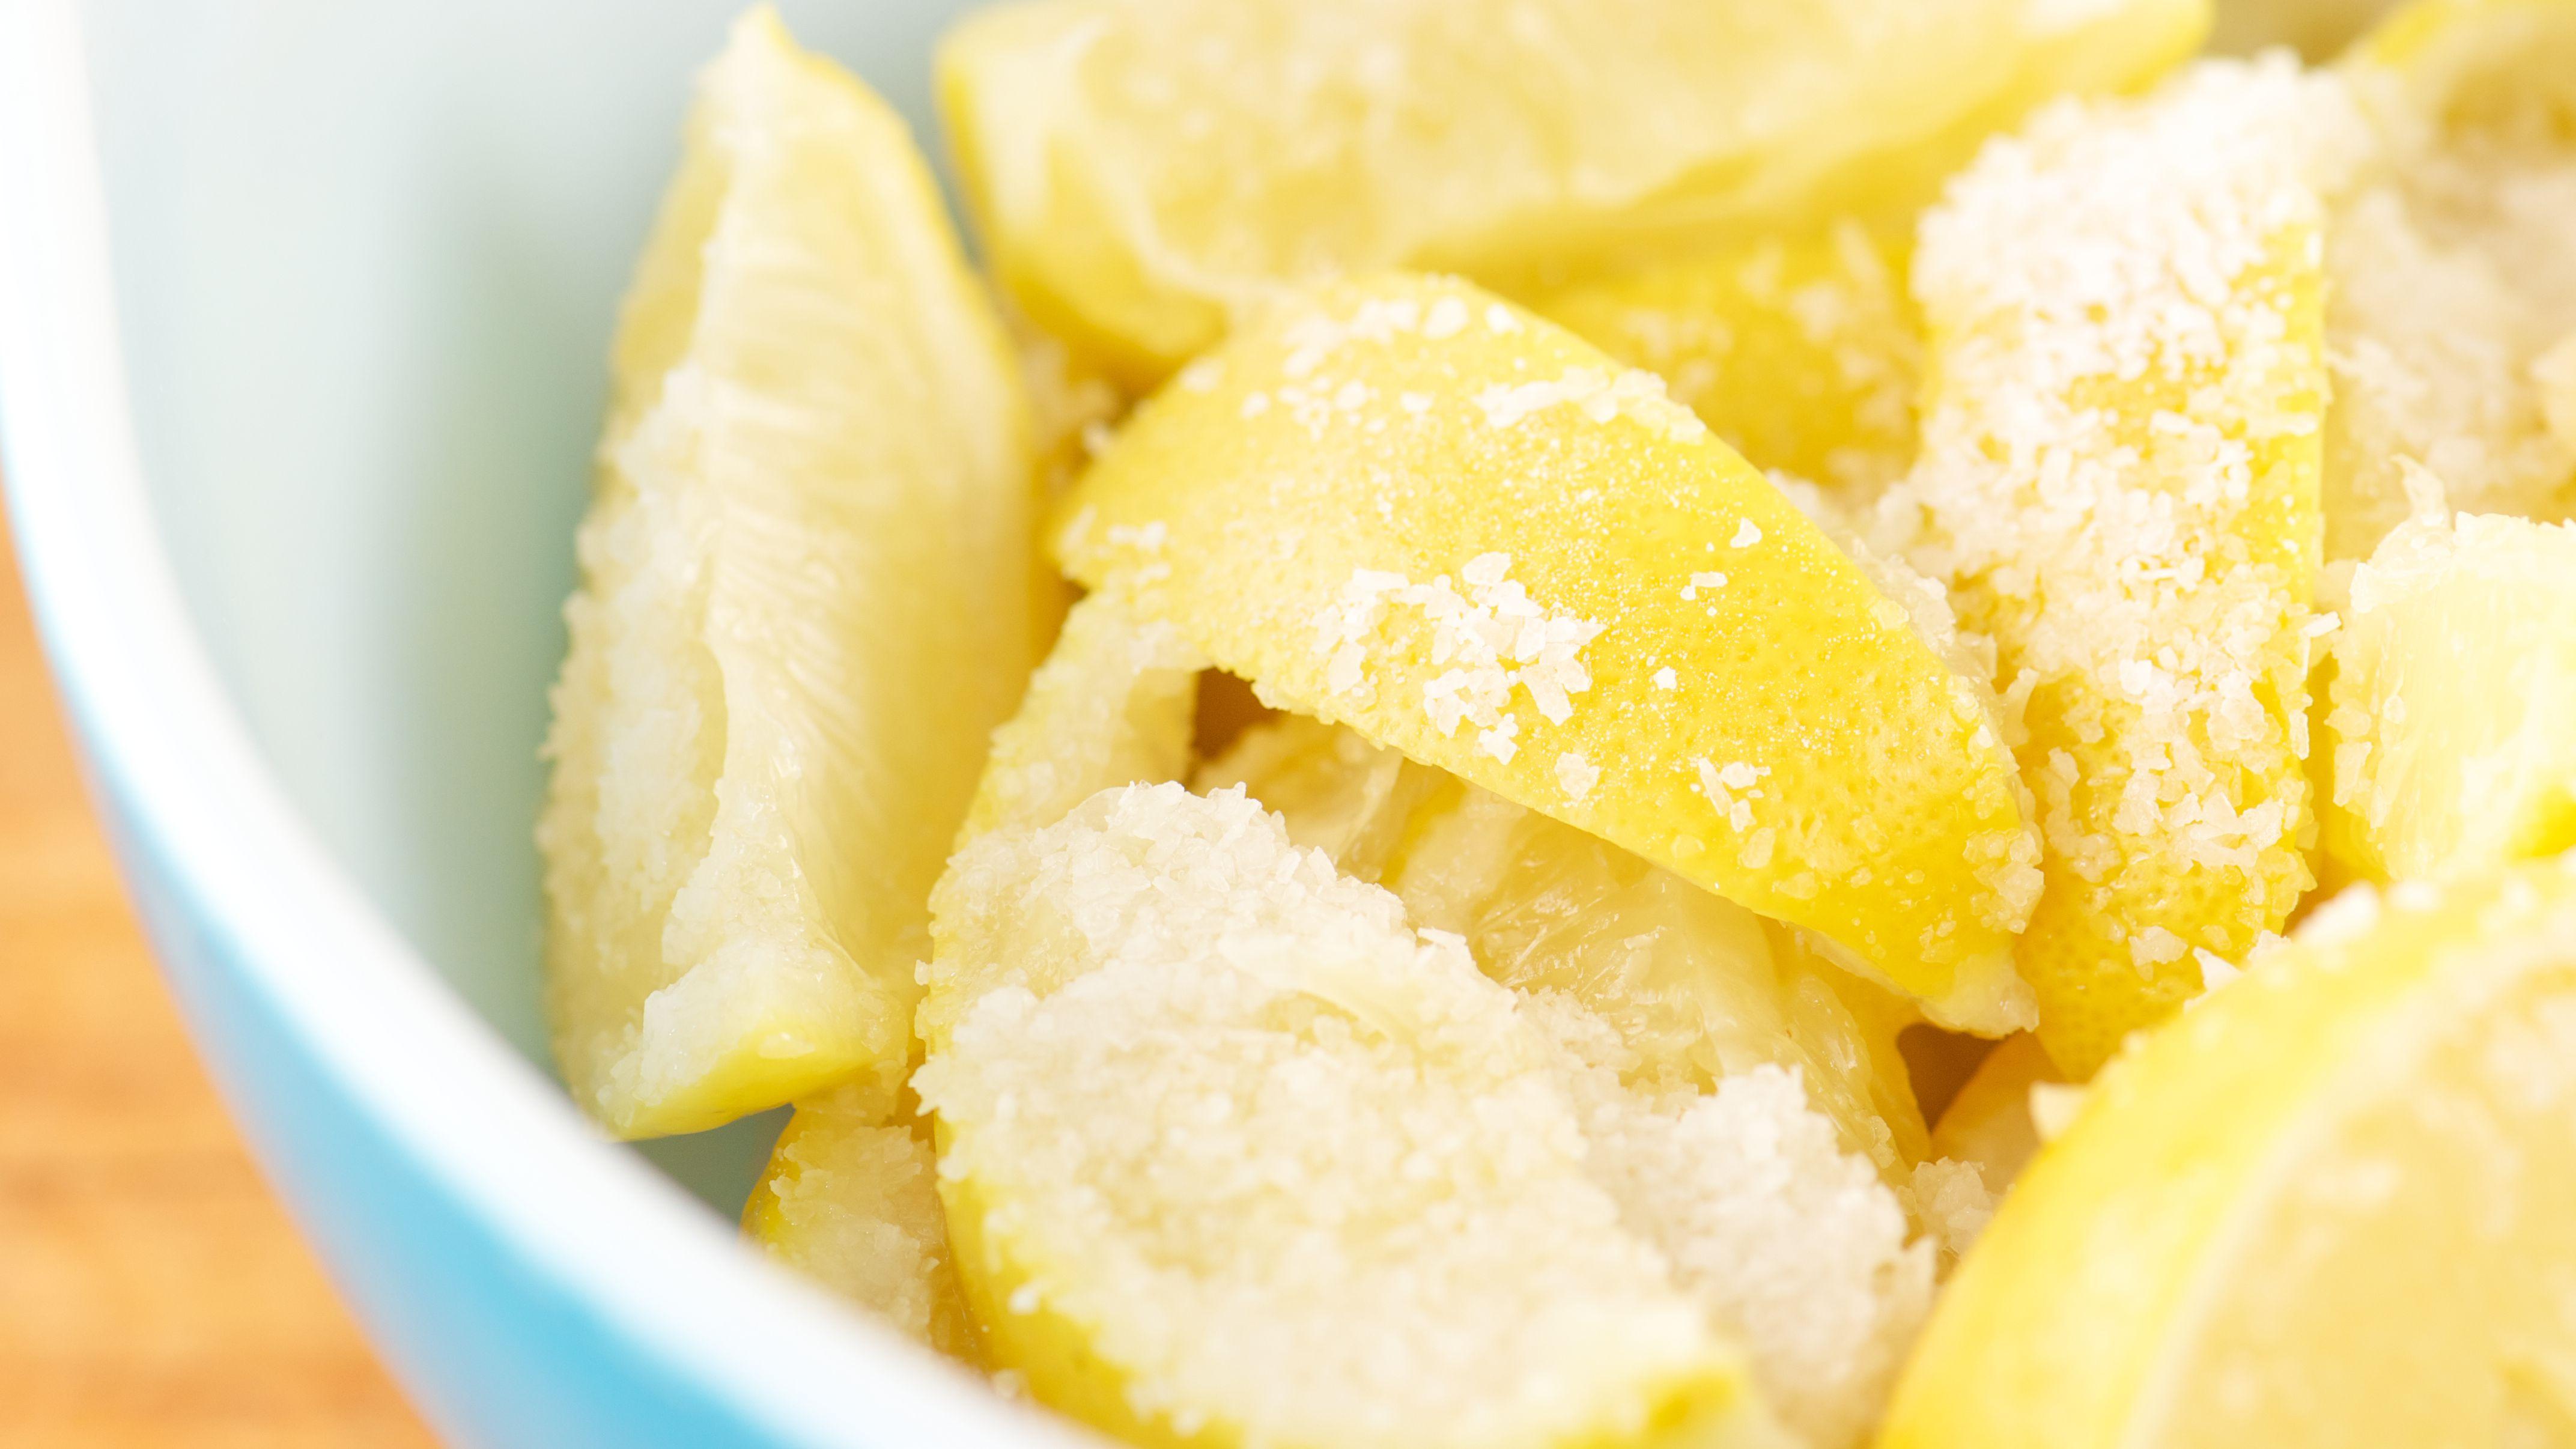 Using Salt As A Food Preservative